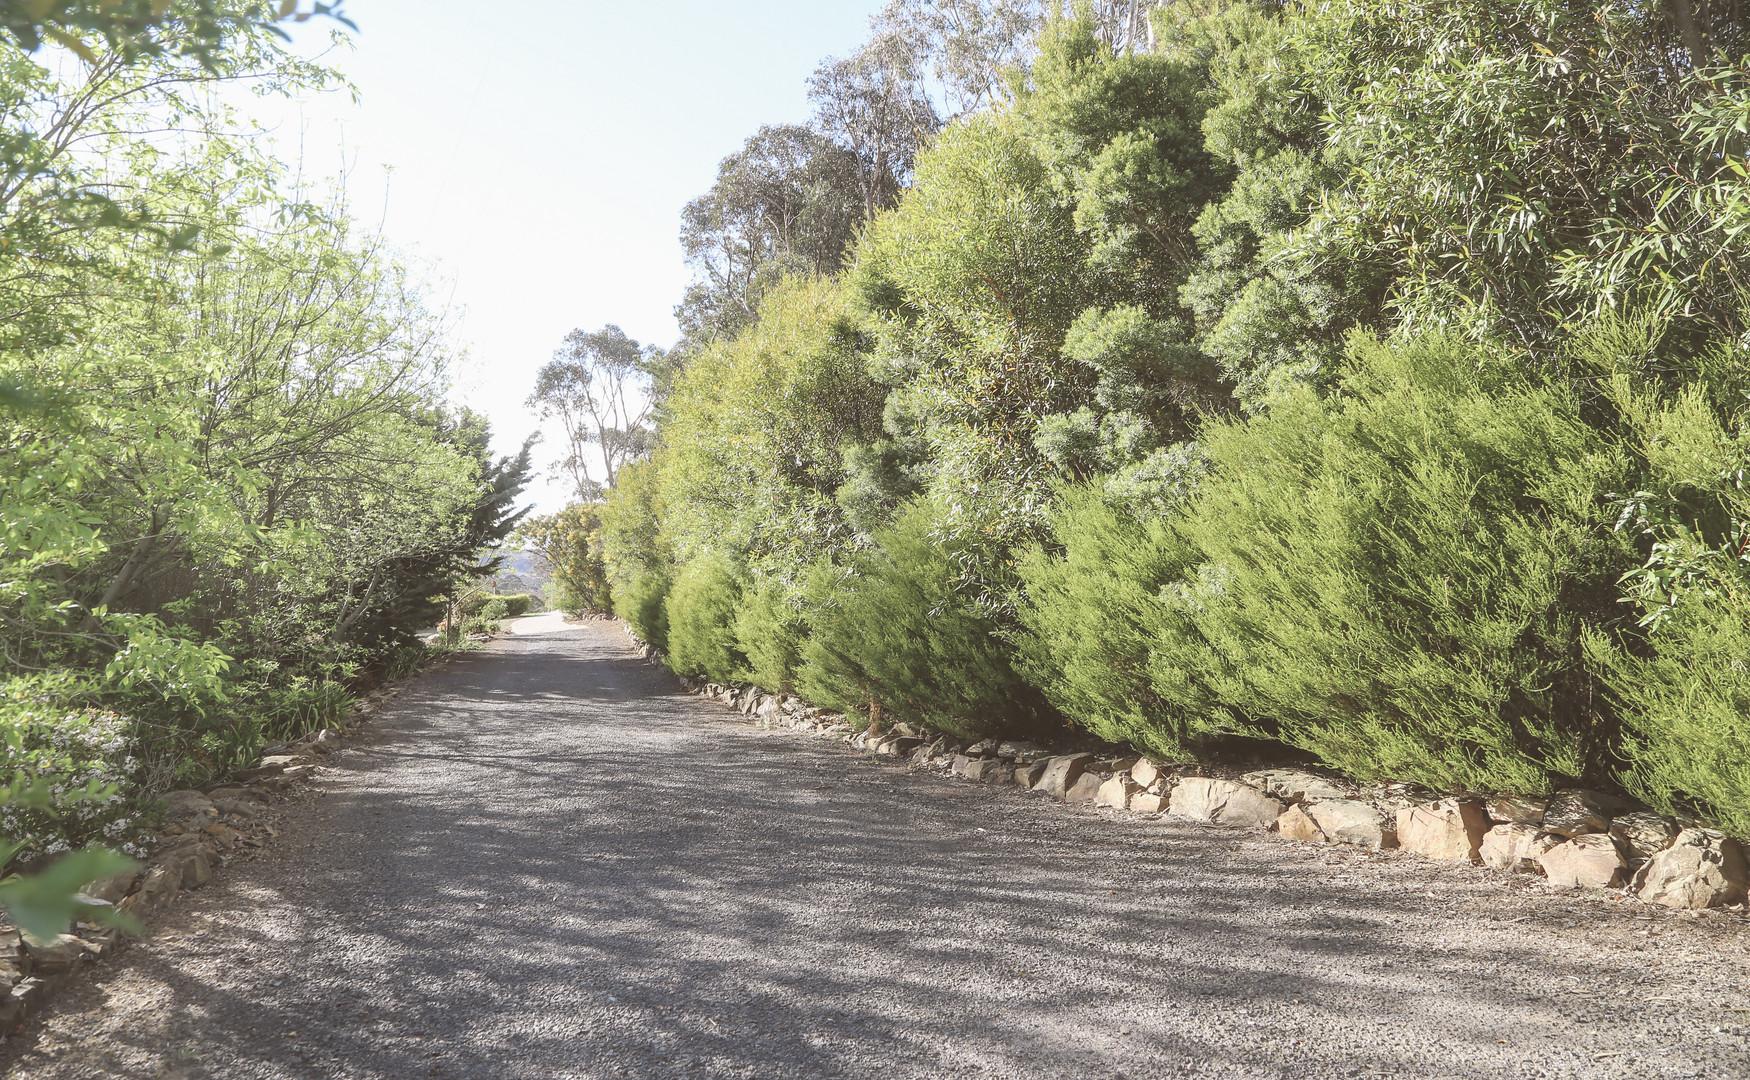 Landscape_Day_Pathways_2019_IMG_3089.jpg